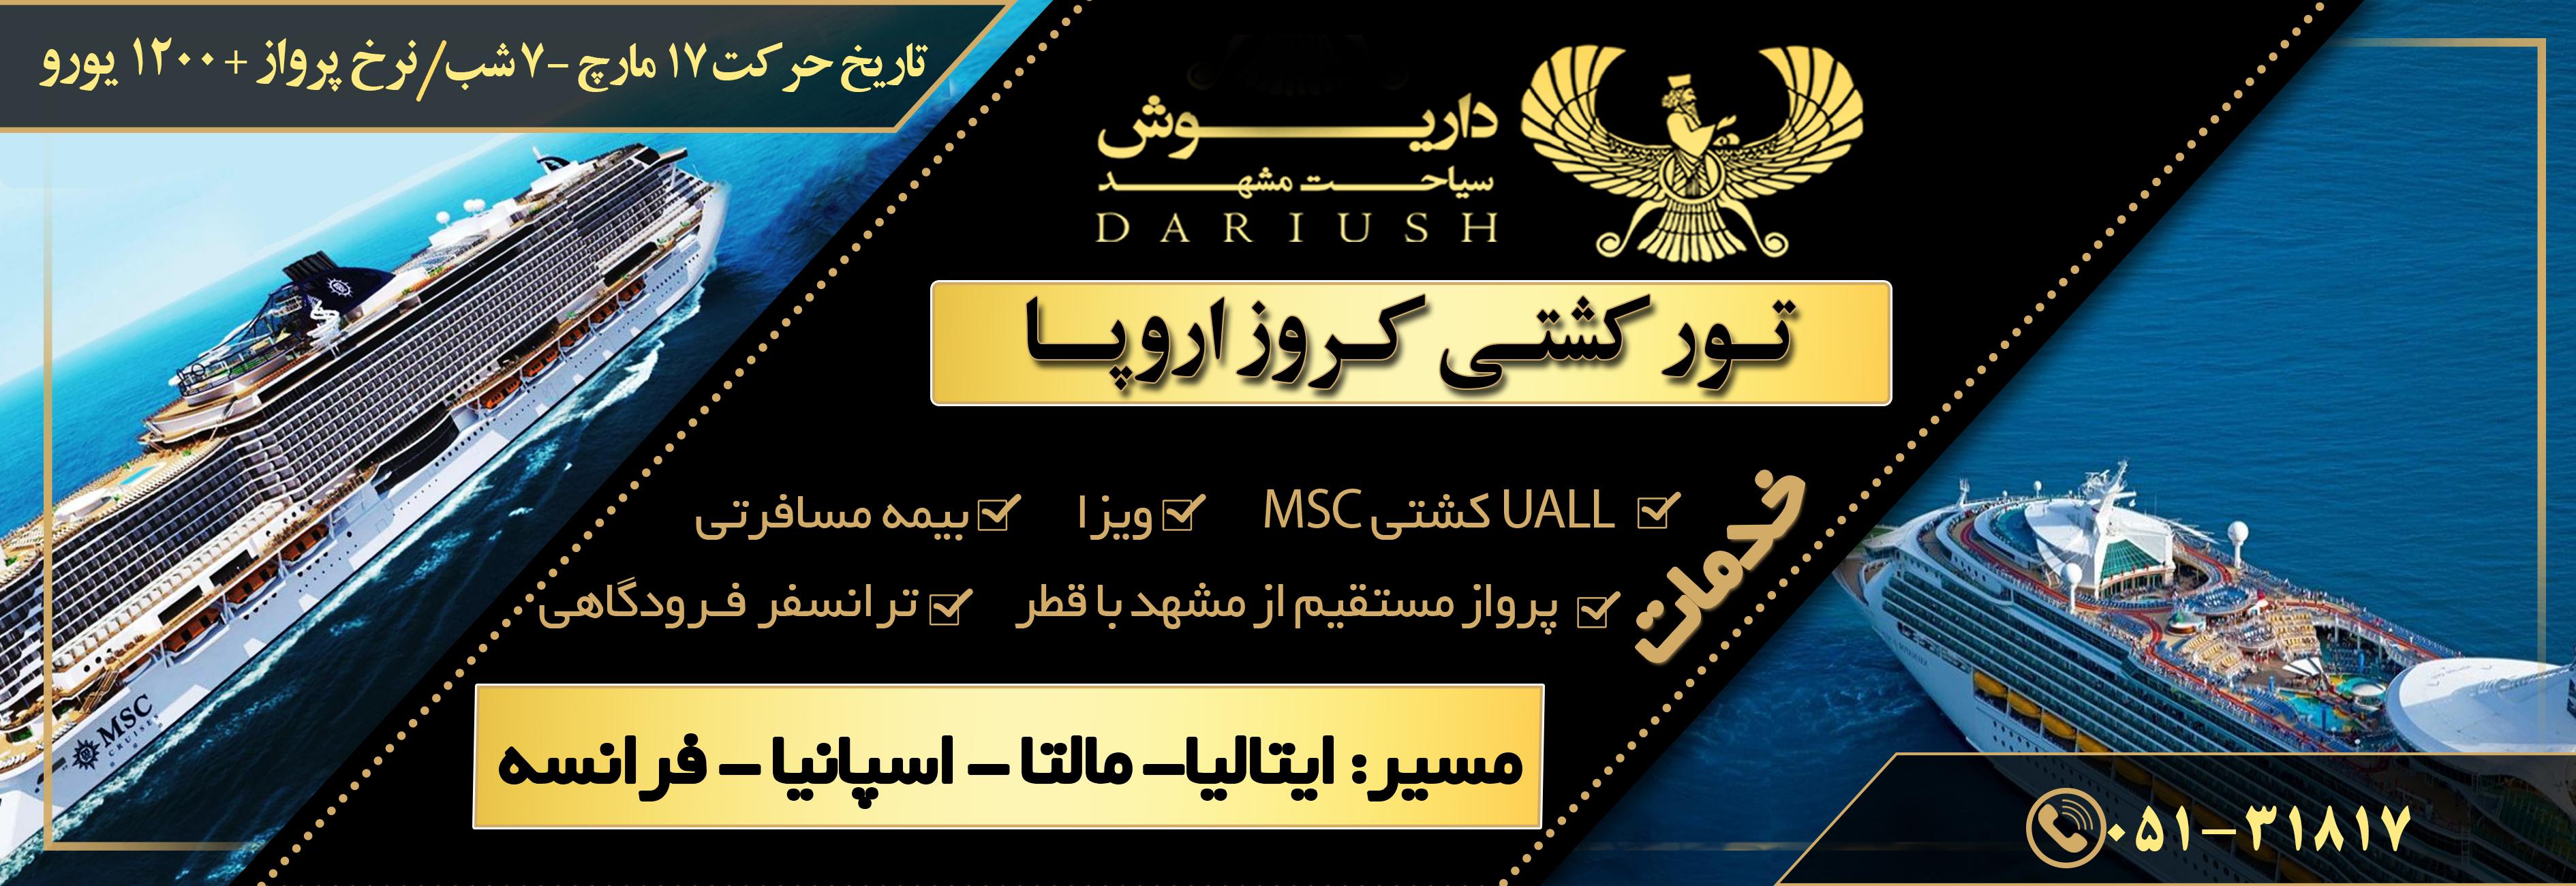 آژانس داریوش مشهد, تور کشتی کروز ویژه نوروز 98